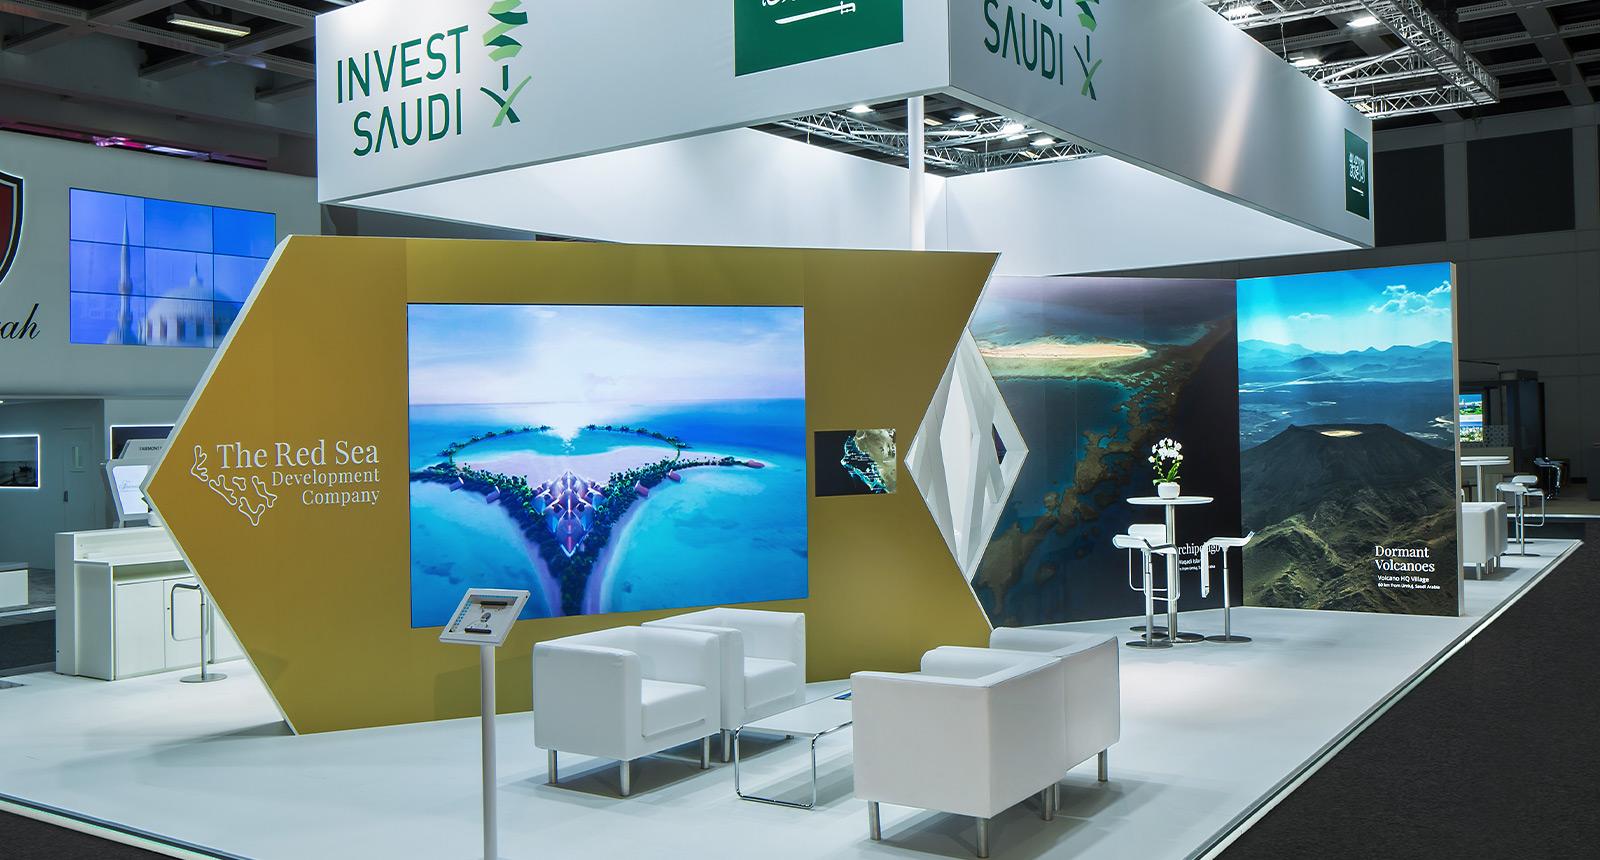 Temporäre Markenwelt - Invest Saudi zur ITB 2019